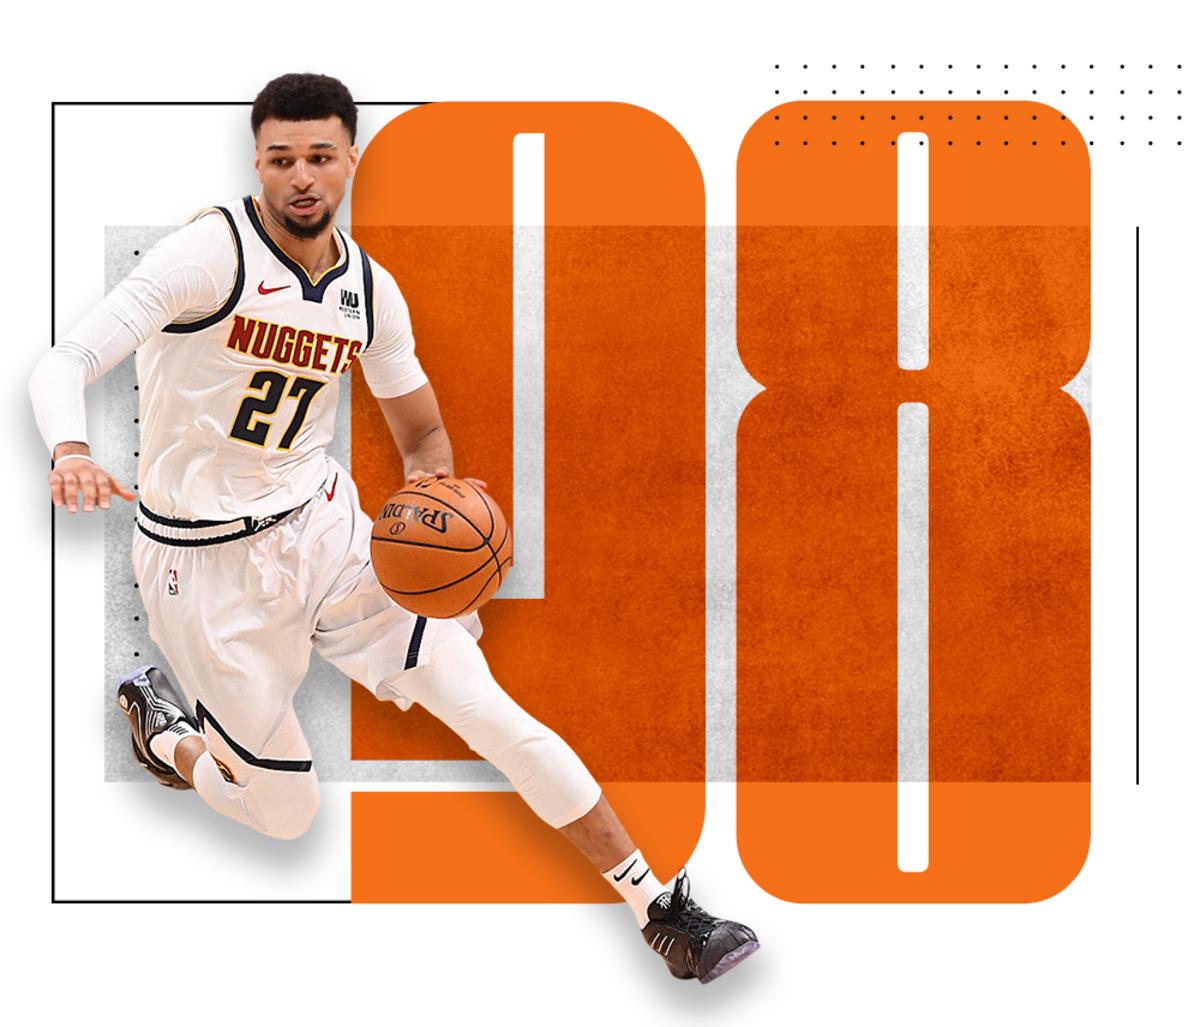 top-100-nba-players-2020-Jamal-Murray.png